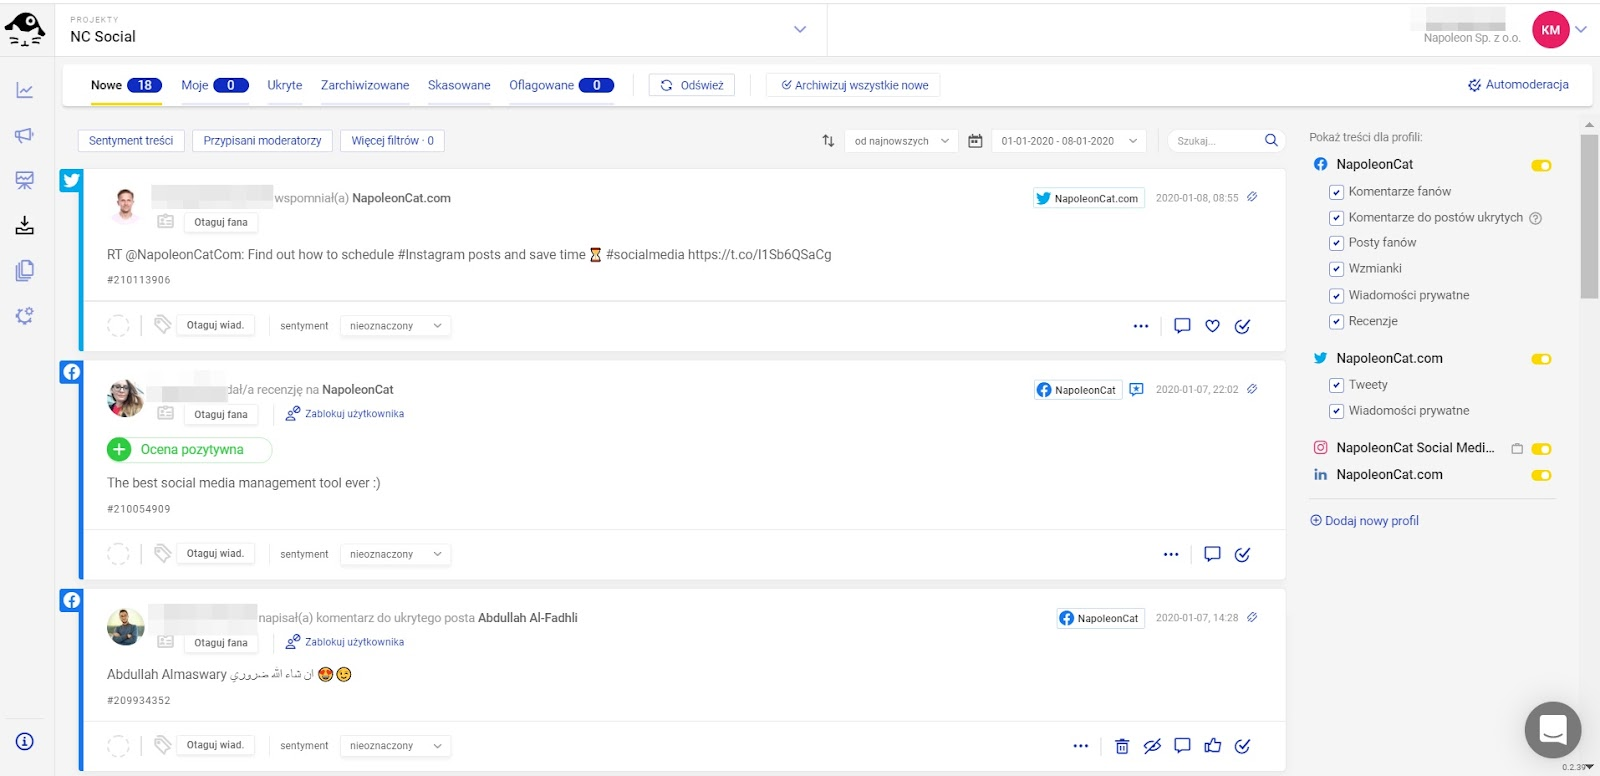 NapoleonCat social inbox